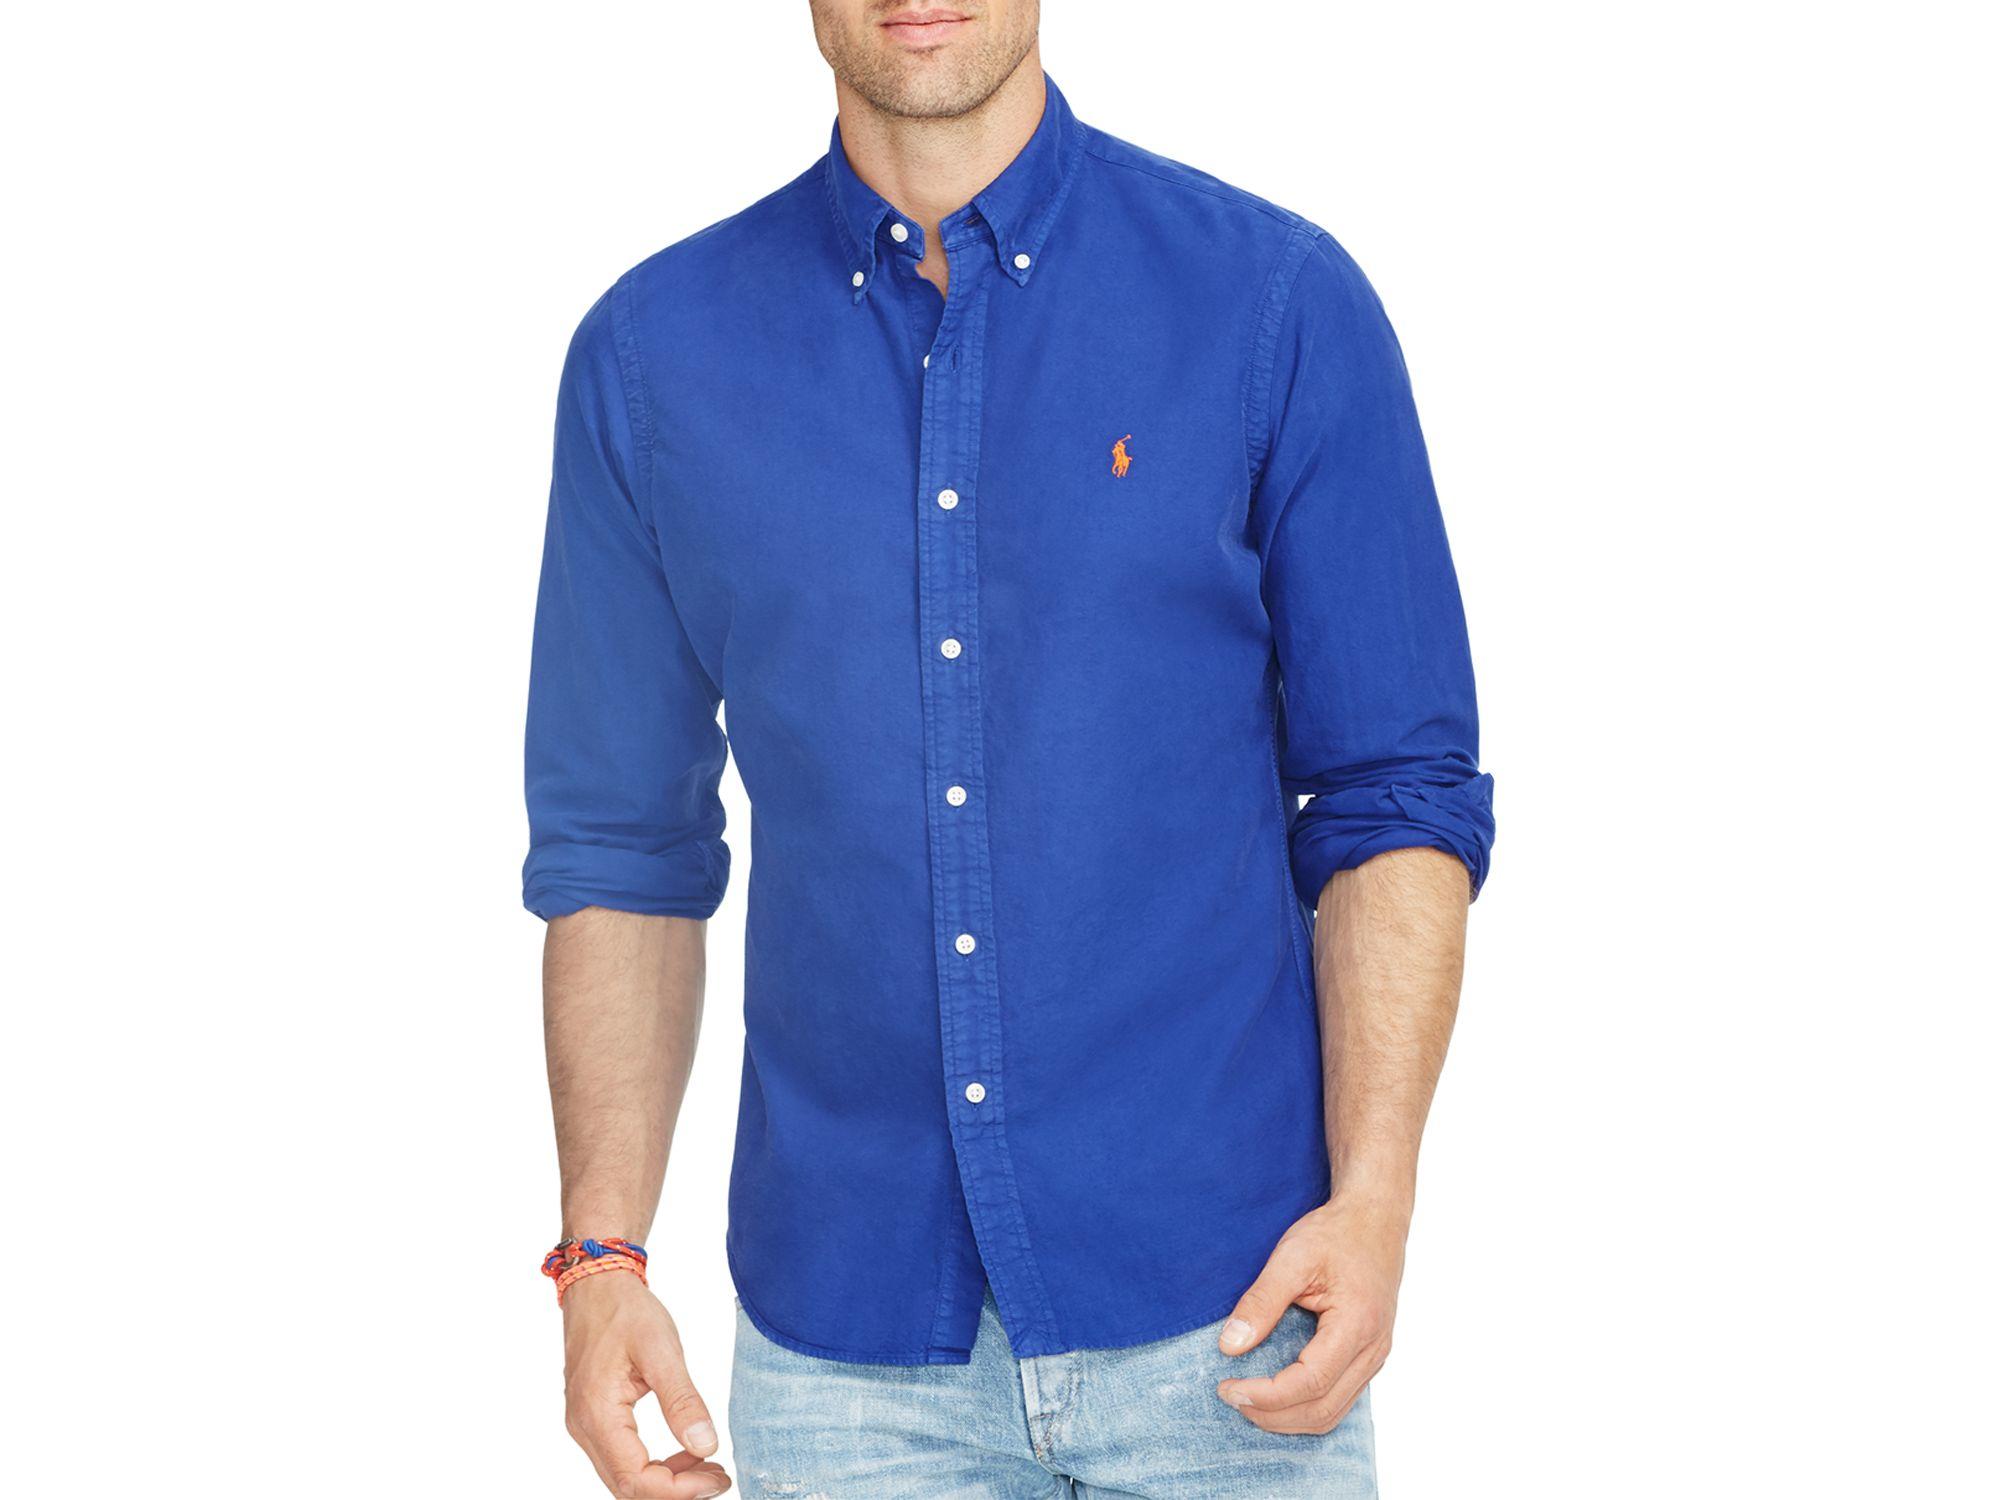 Lyst Ralph Lauren Polo Oxford Shirt In Blue For Men